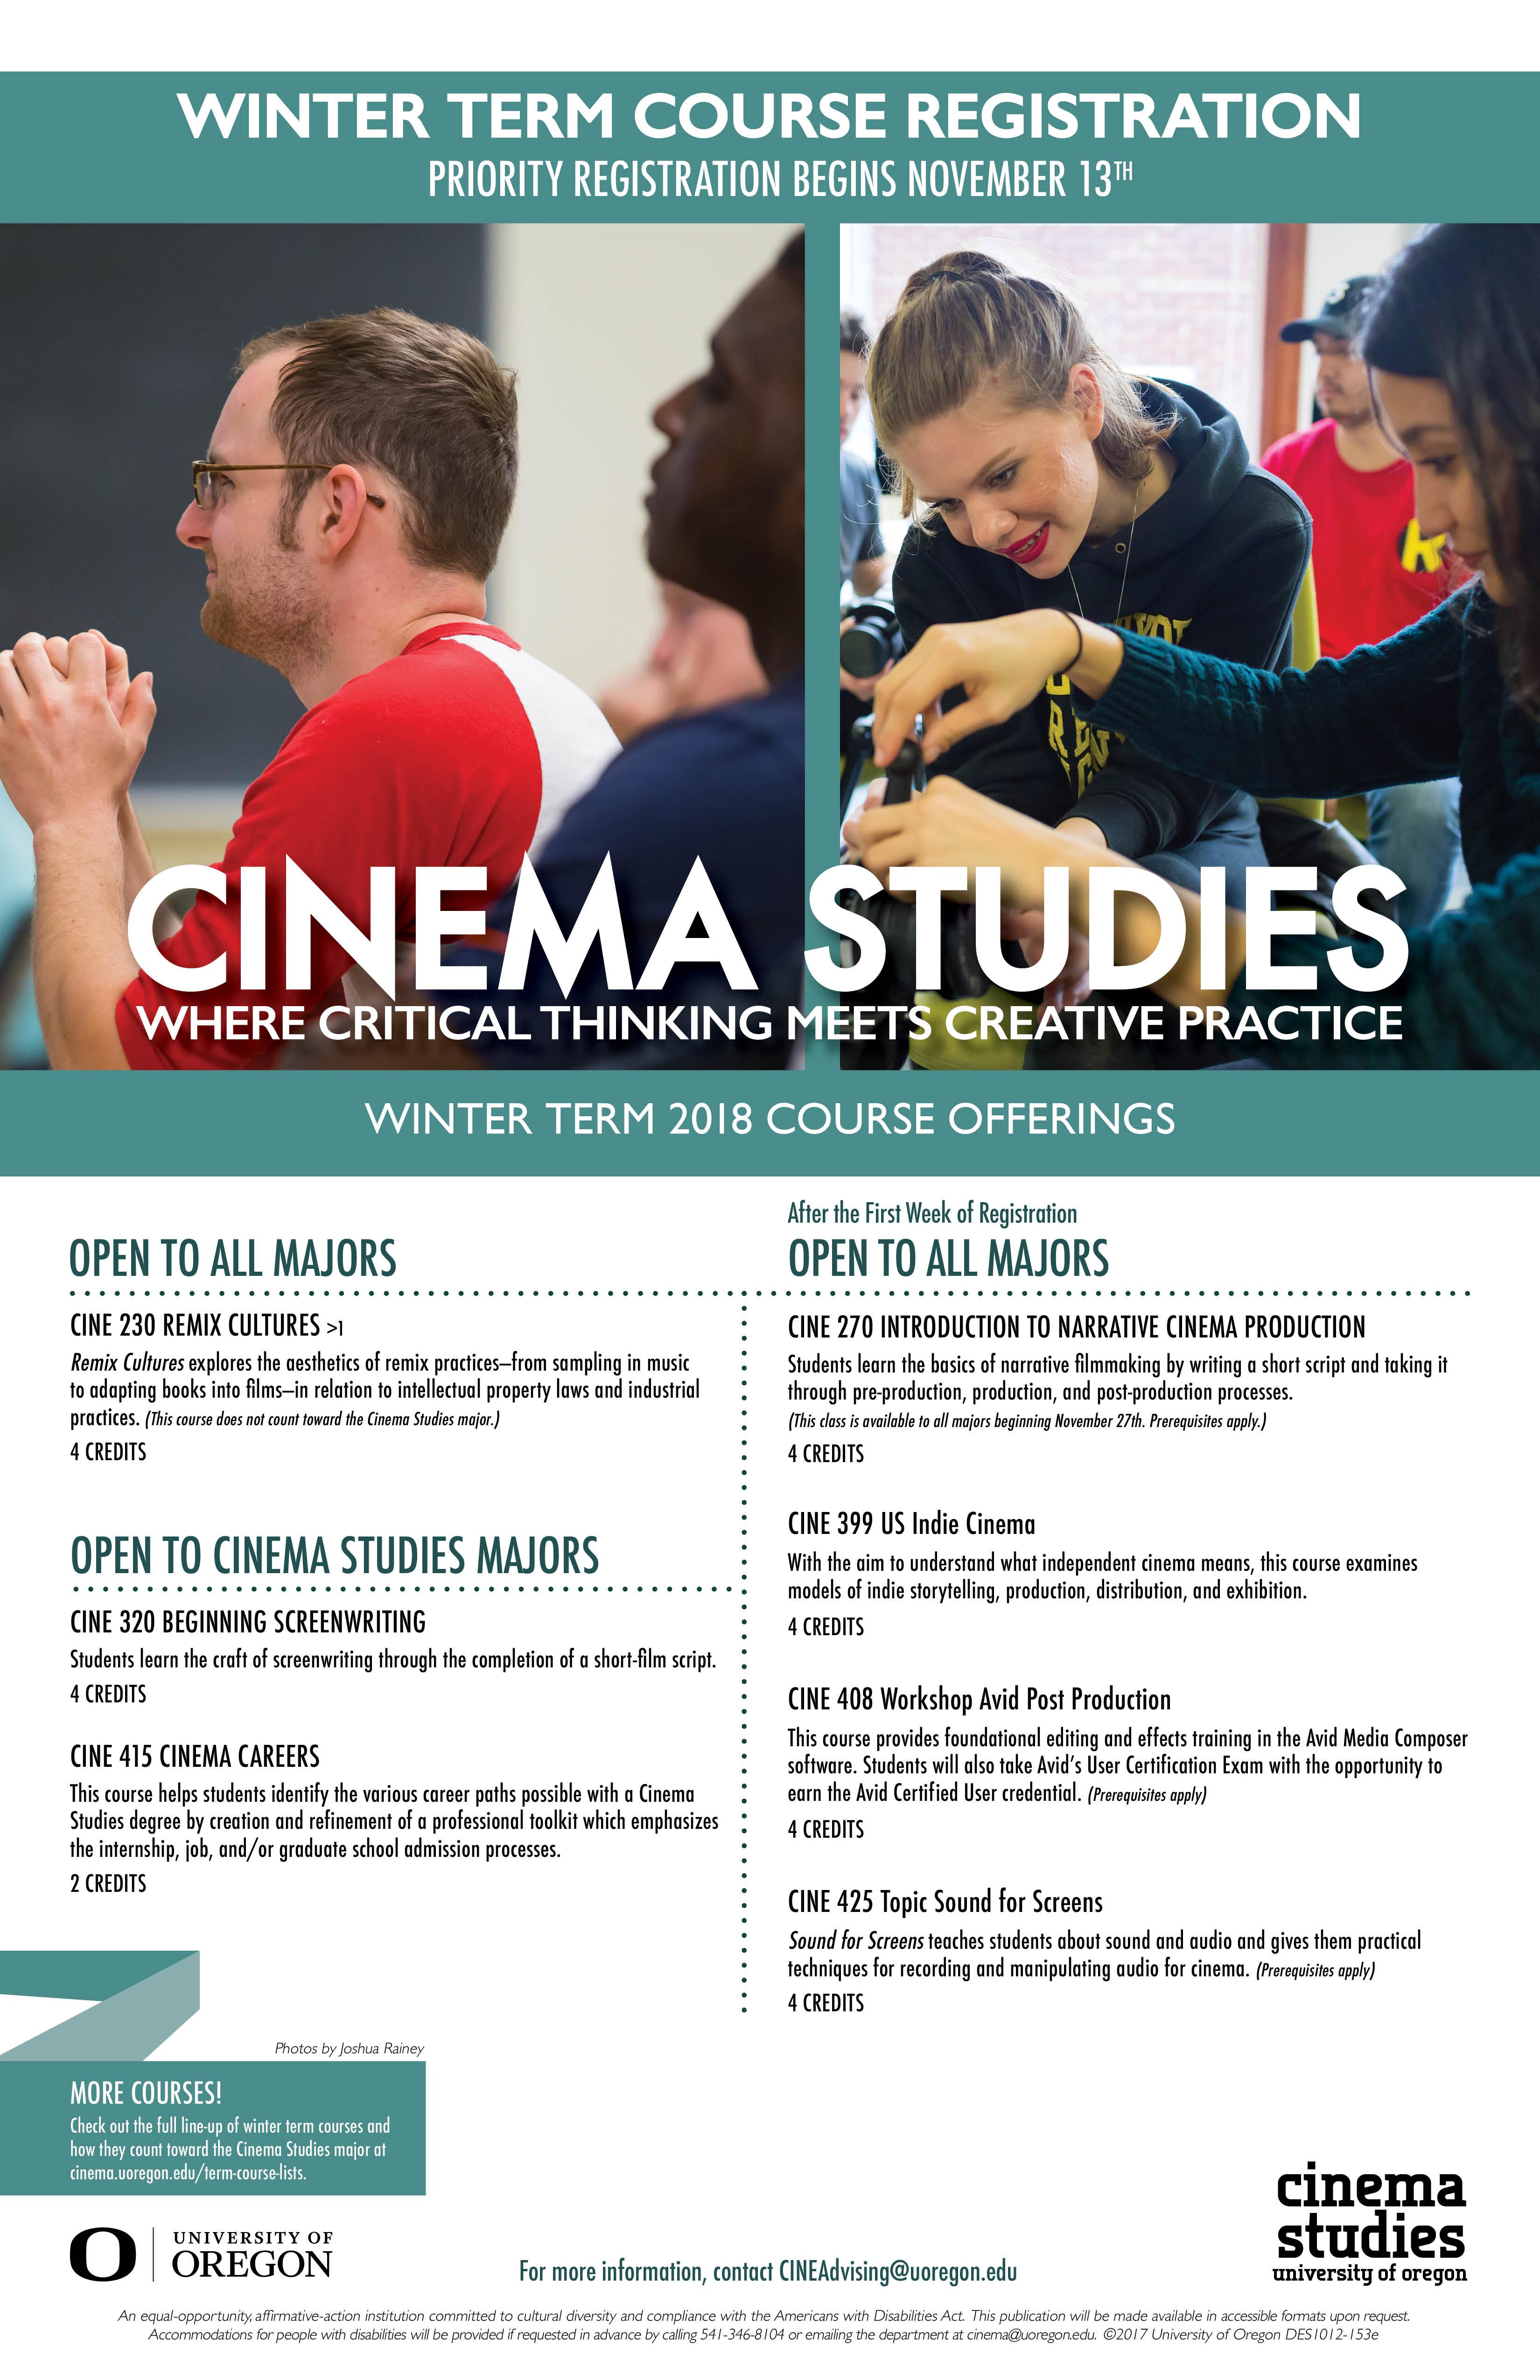 Winter Term 2018 Course List Now Available Cinema Studies